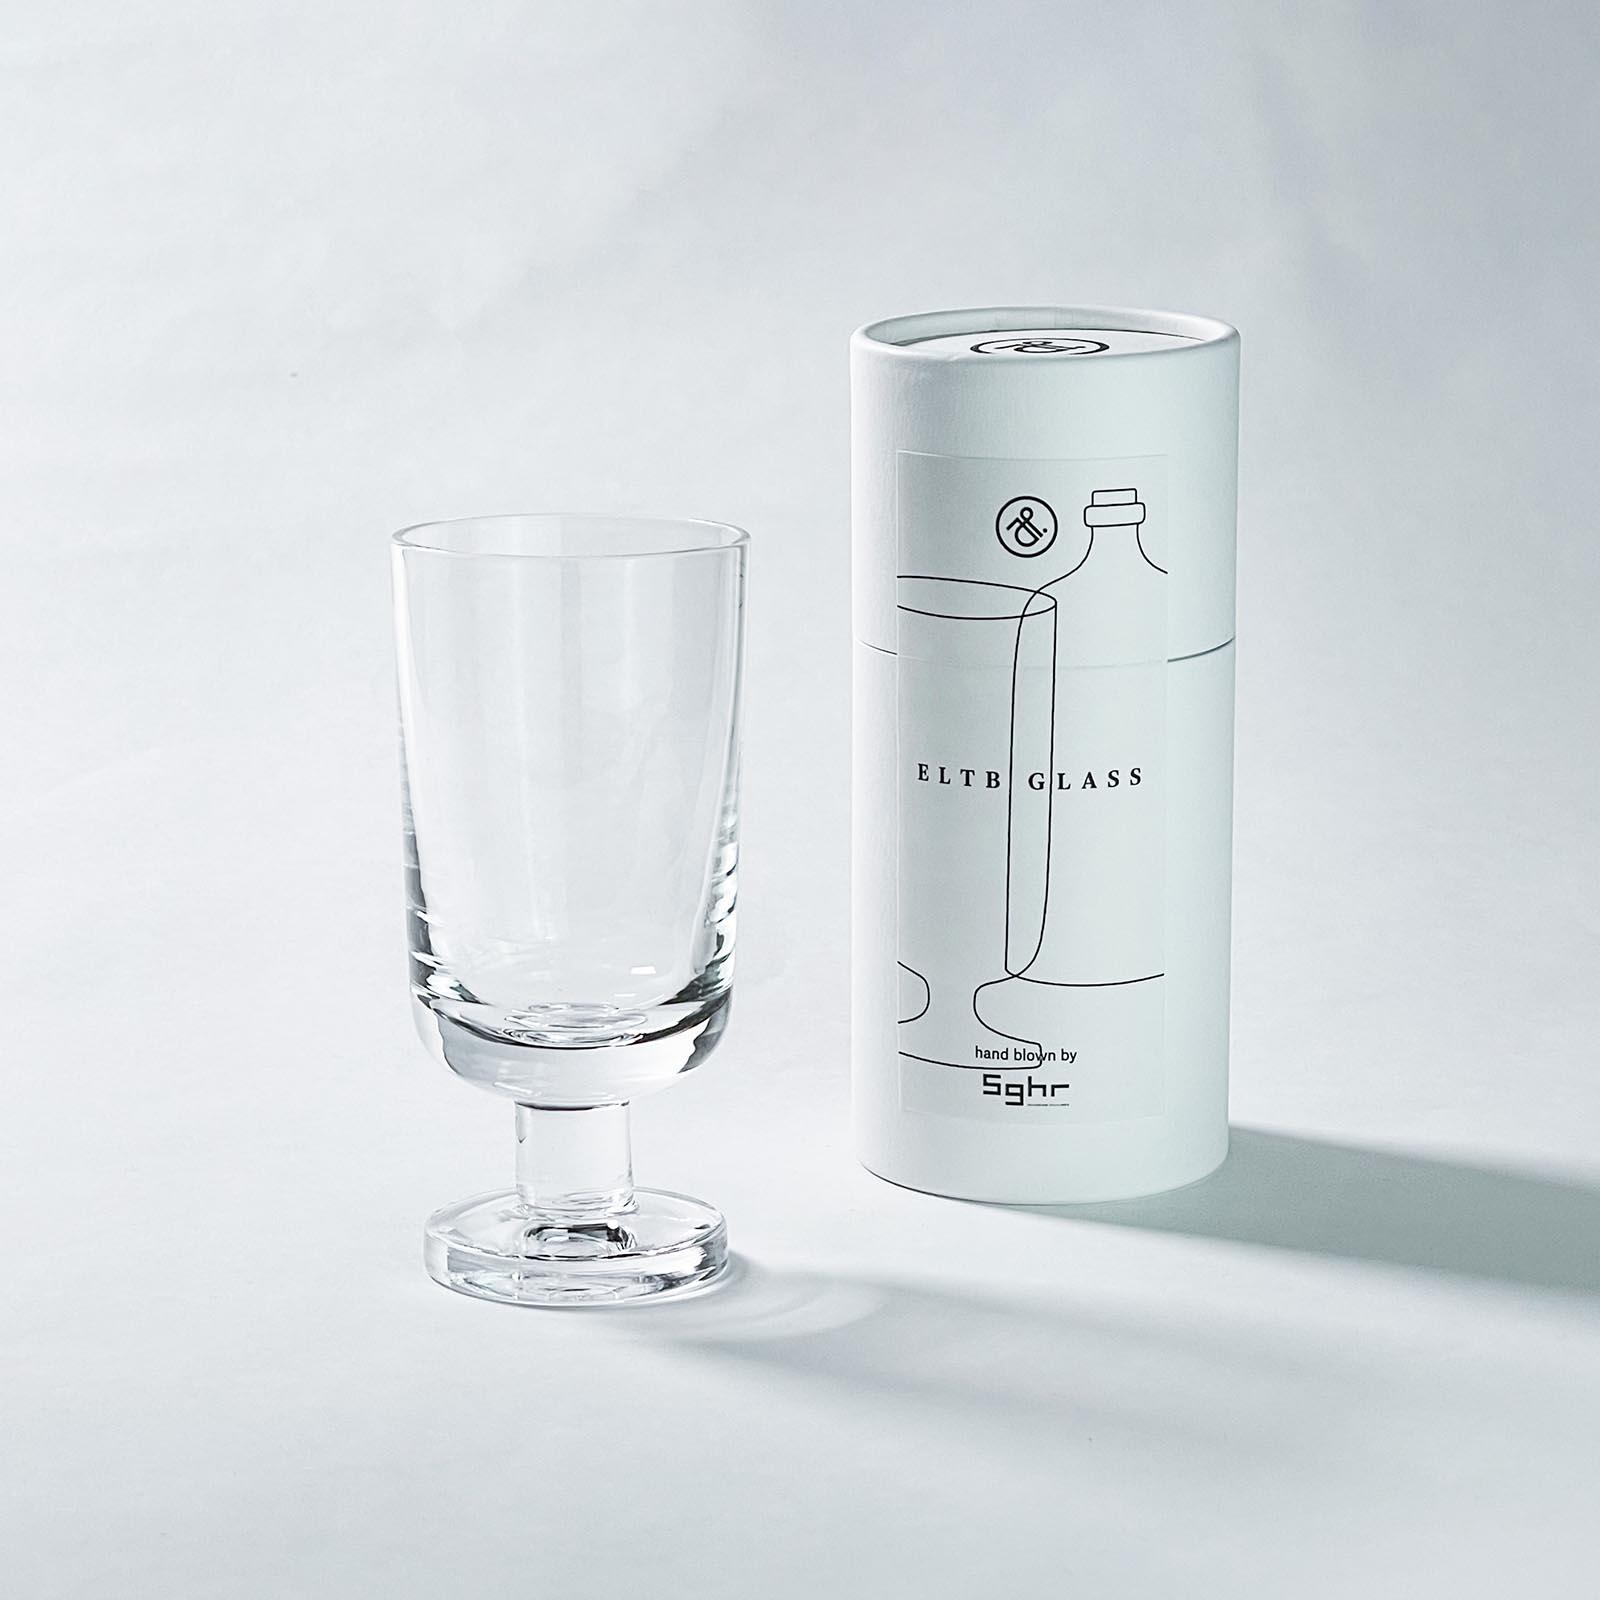 mitosaya × Sghr:蒸留酒 BANCHADOKI 1本+ELTB GLASS 1客 セット GIFT